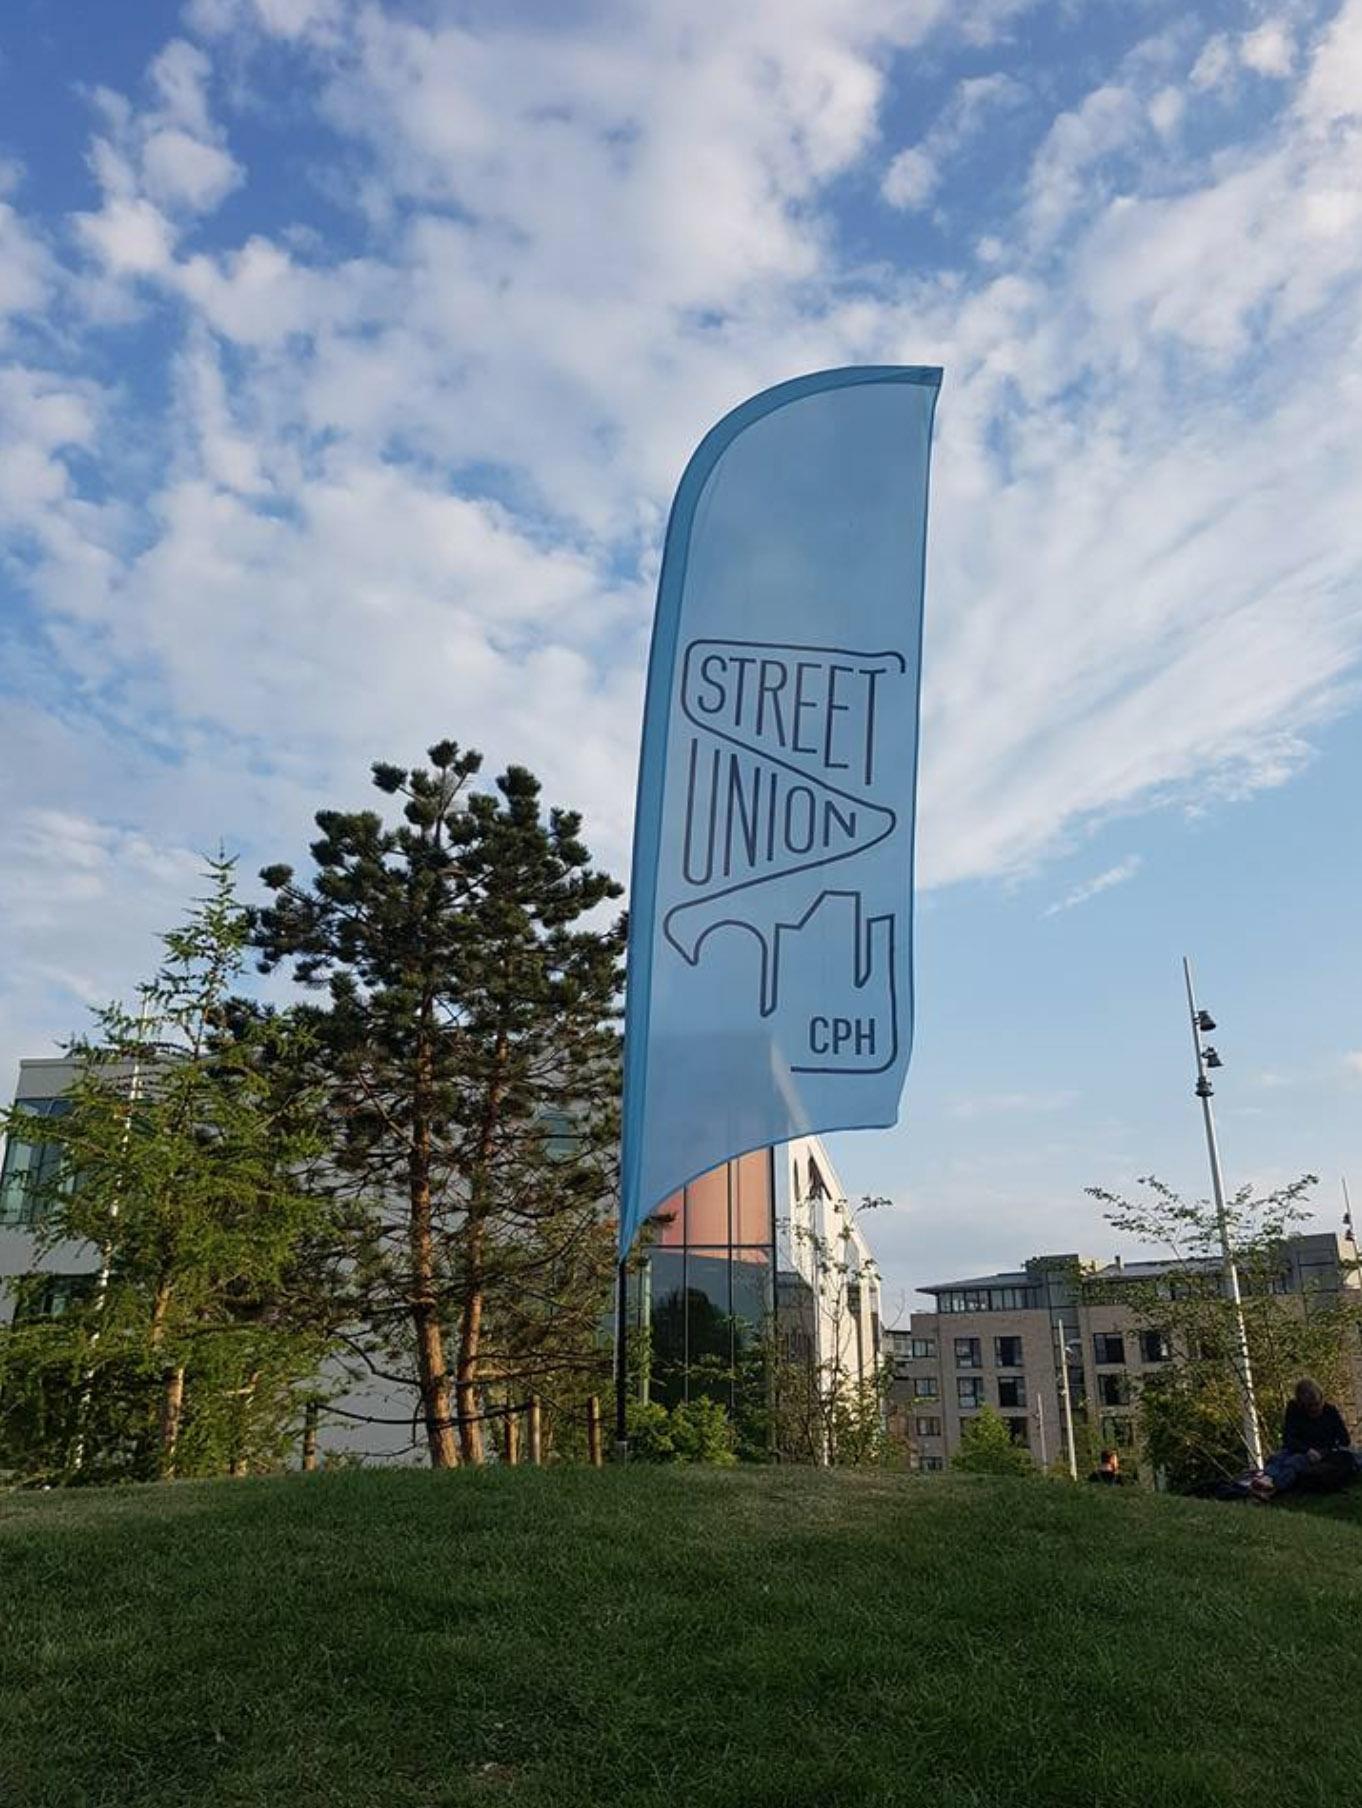 Street_union_2018_flag